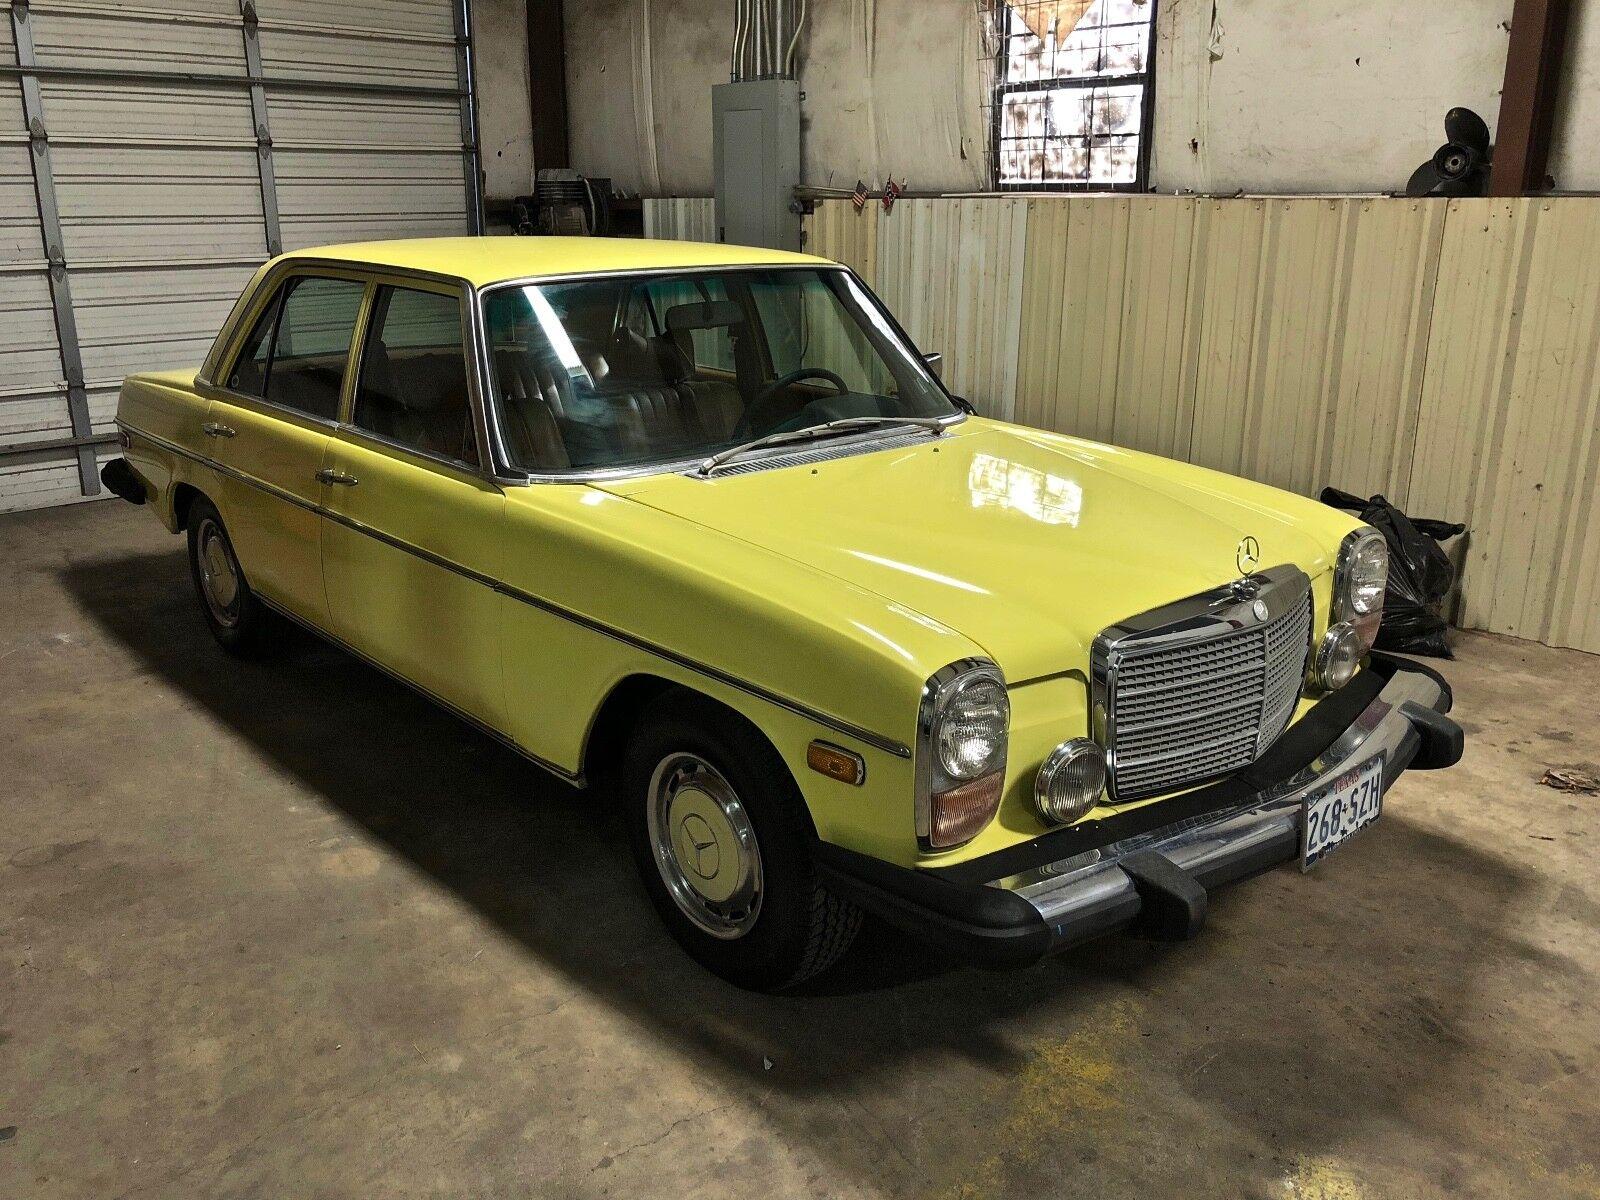 1975 Mercedes-Benz 300-Series 300D TURBO 47K MILES 1975 MERCEDES BENZ 300D TURBO ONLY 47K MILES VERY ORIGINAL MUST SEE SURVIVOR